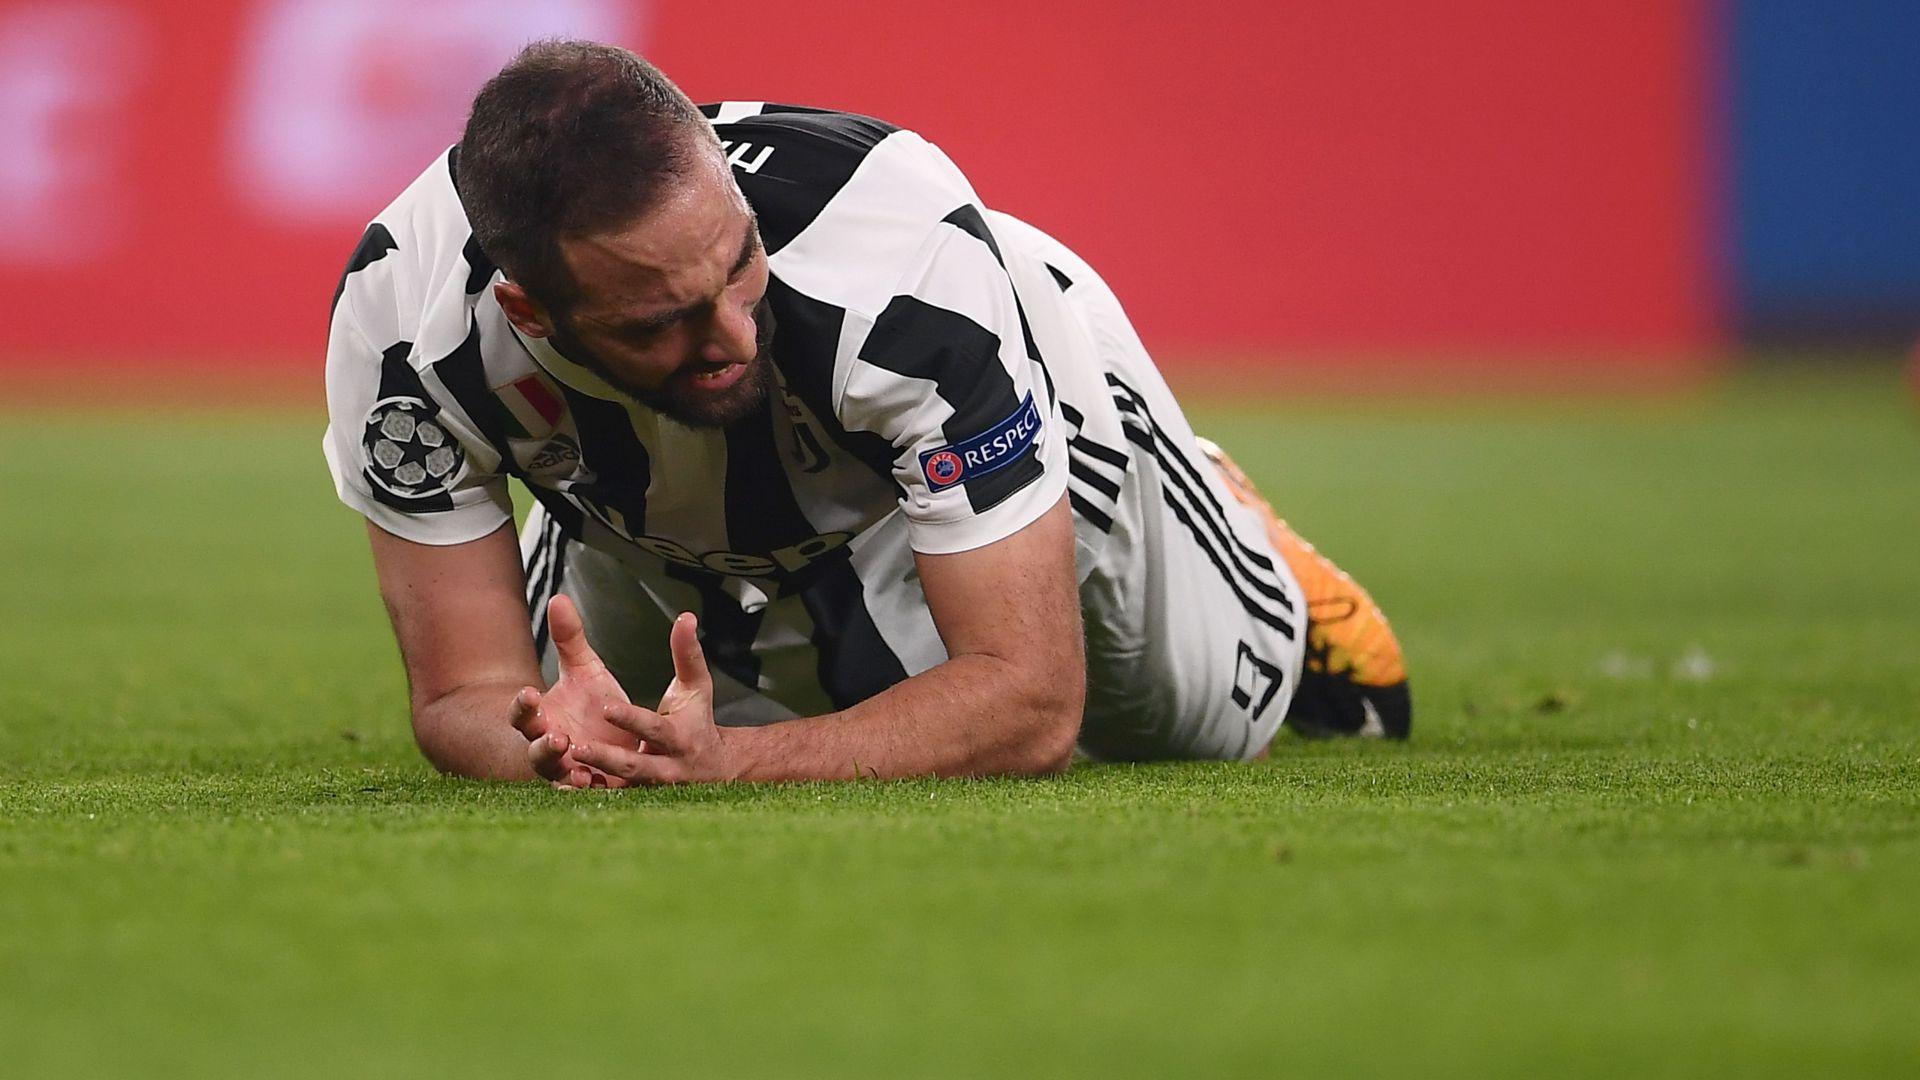 Juventus-Crotone: esordio per Howedes, riposa Higuain